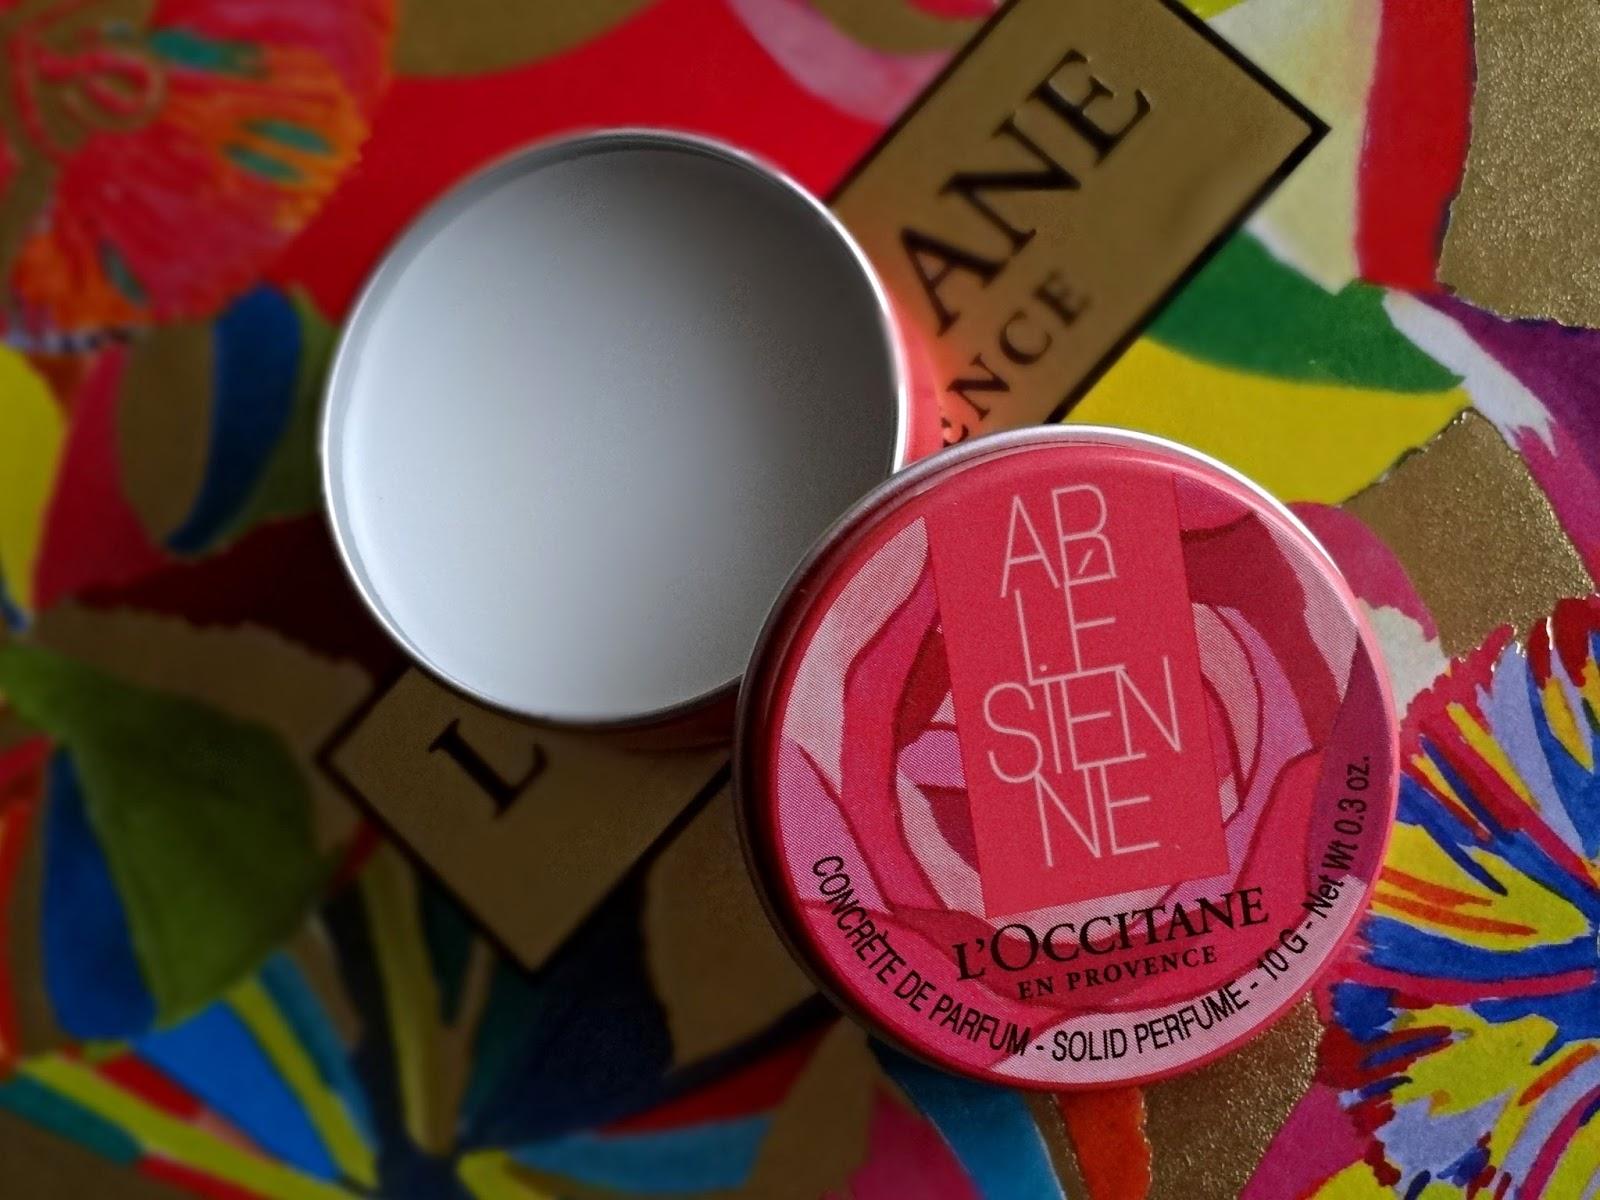 L'occitane Arlesienne Solid Perfume